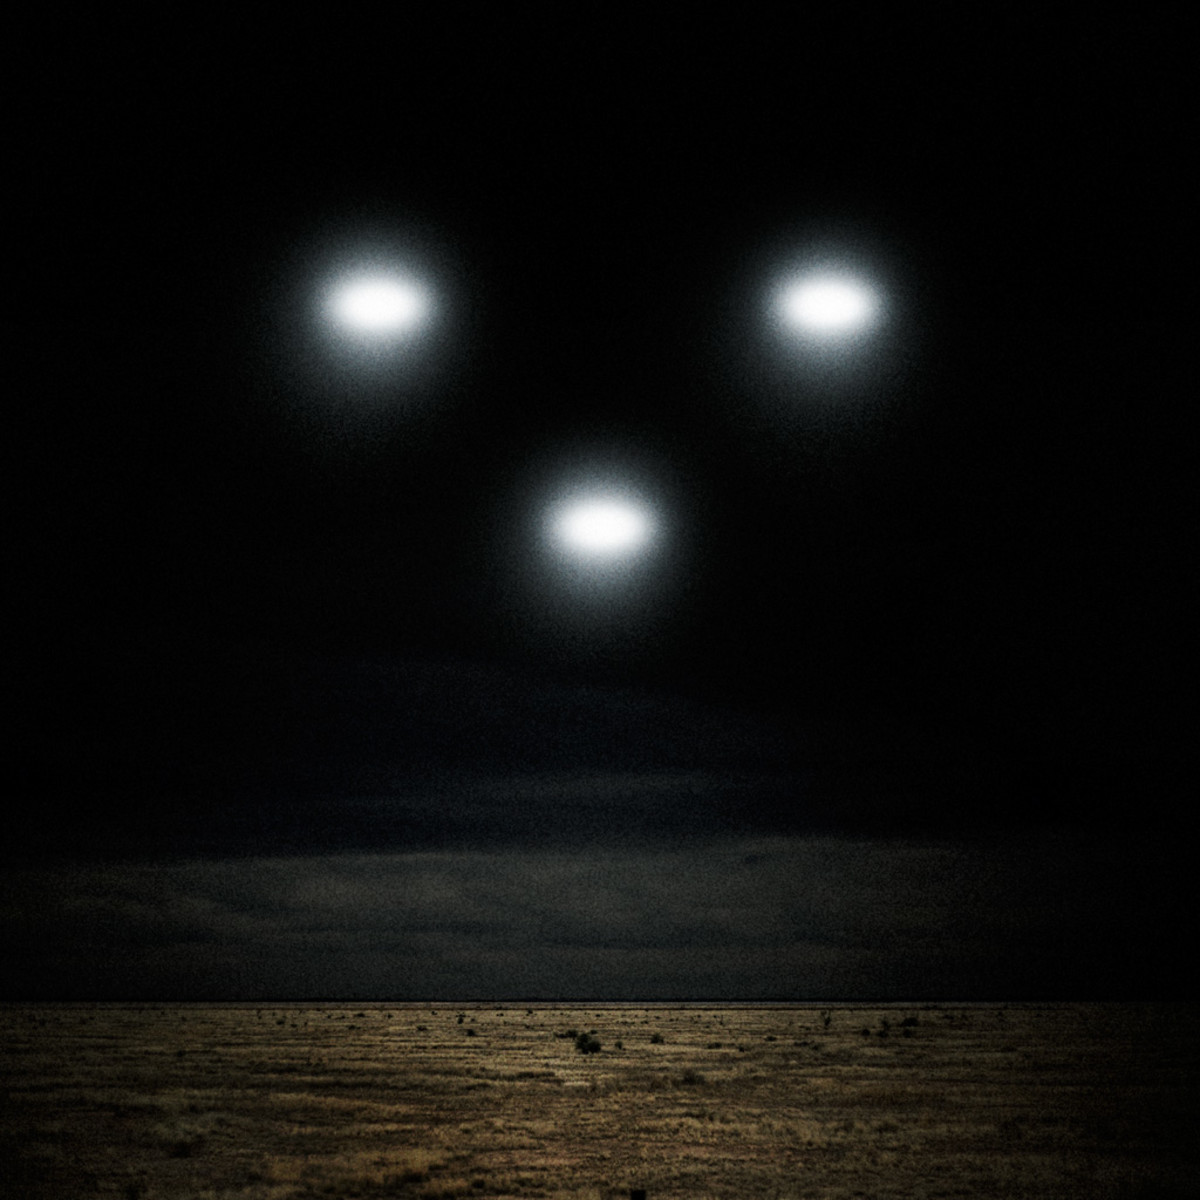 The Min Min Lights Of Australia: Fact Or Fiction?